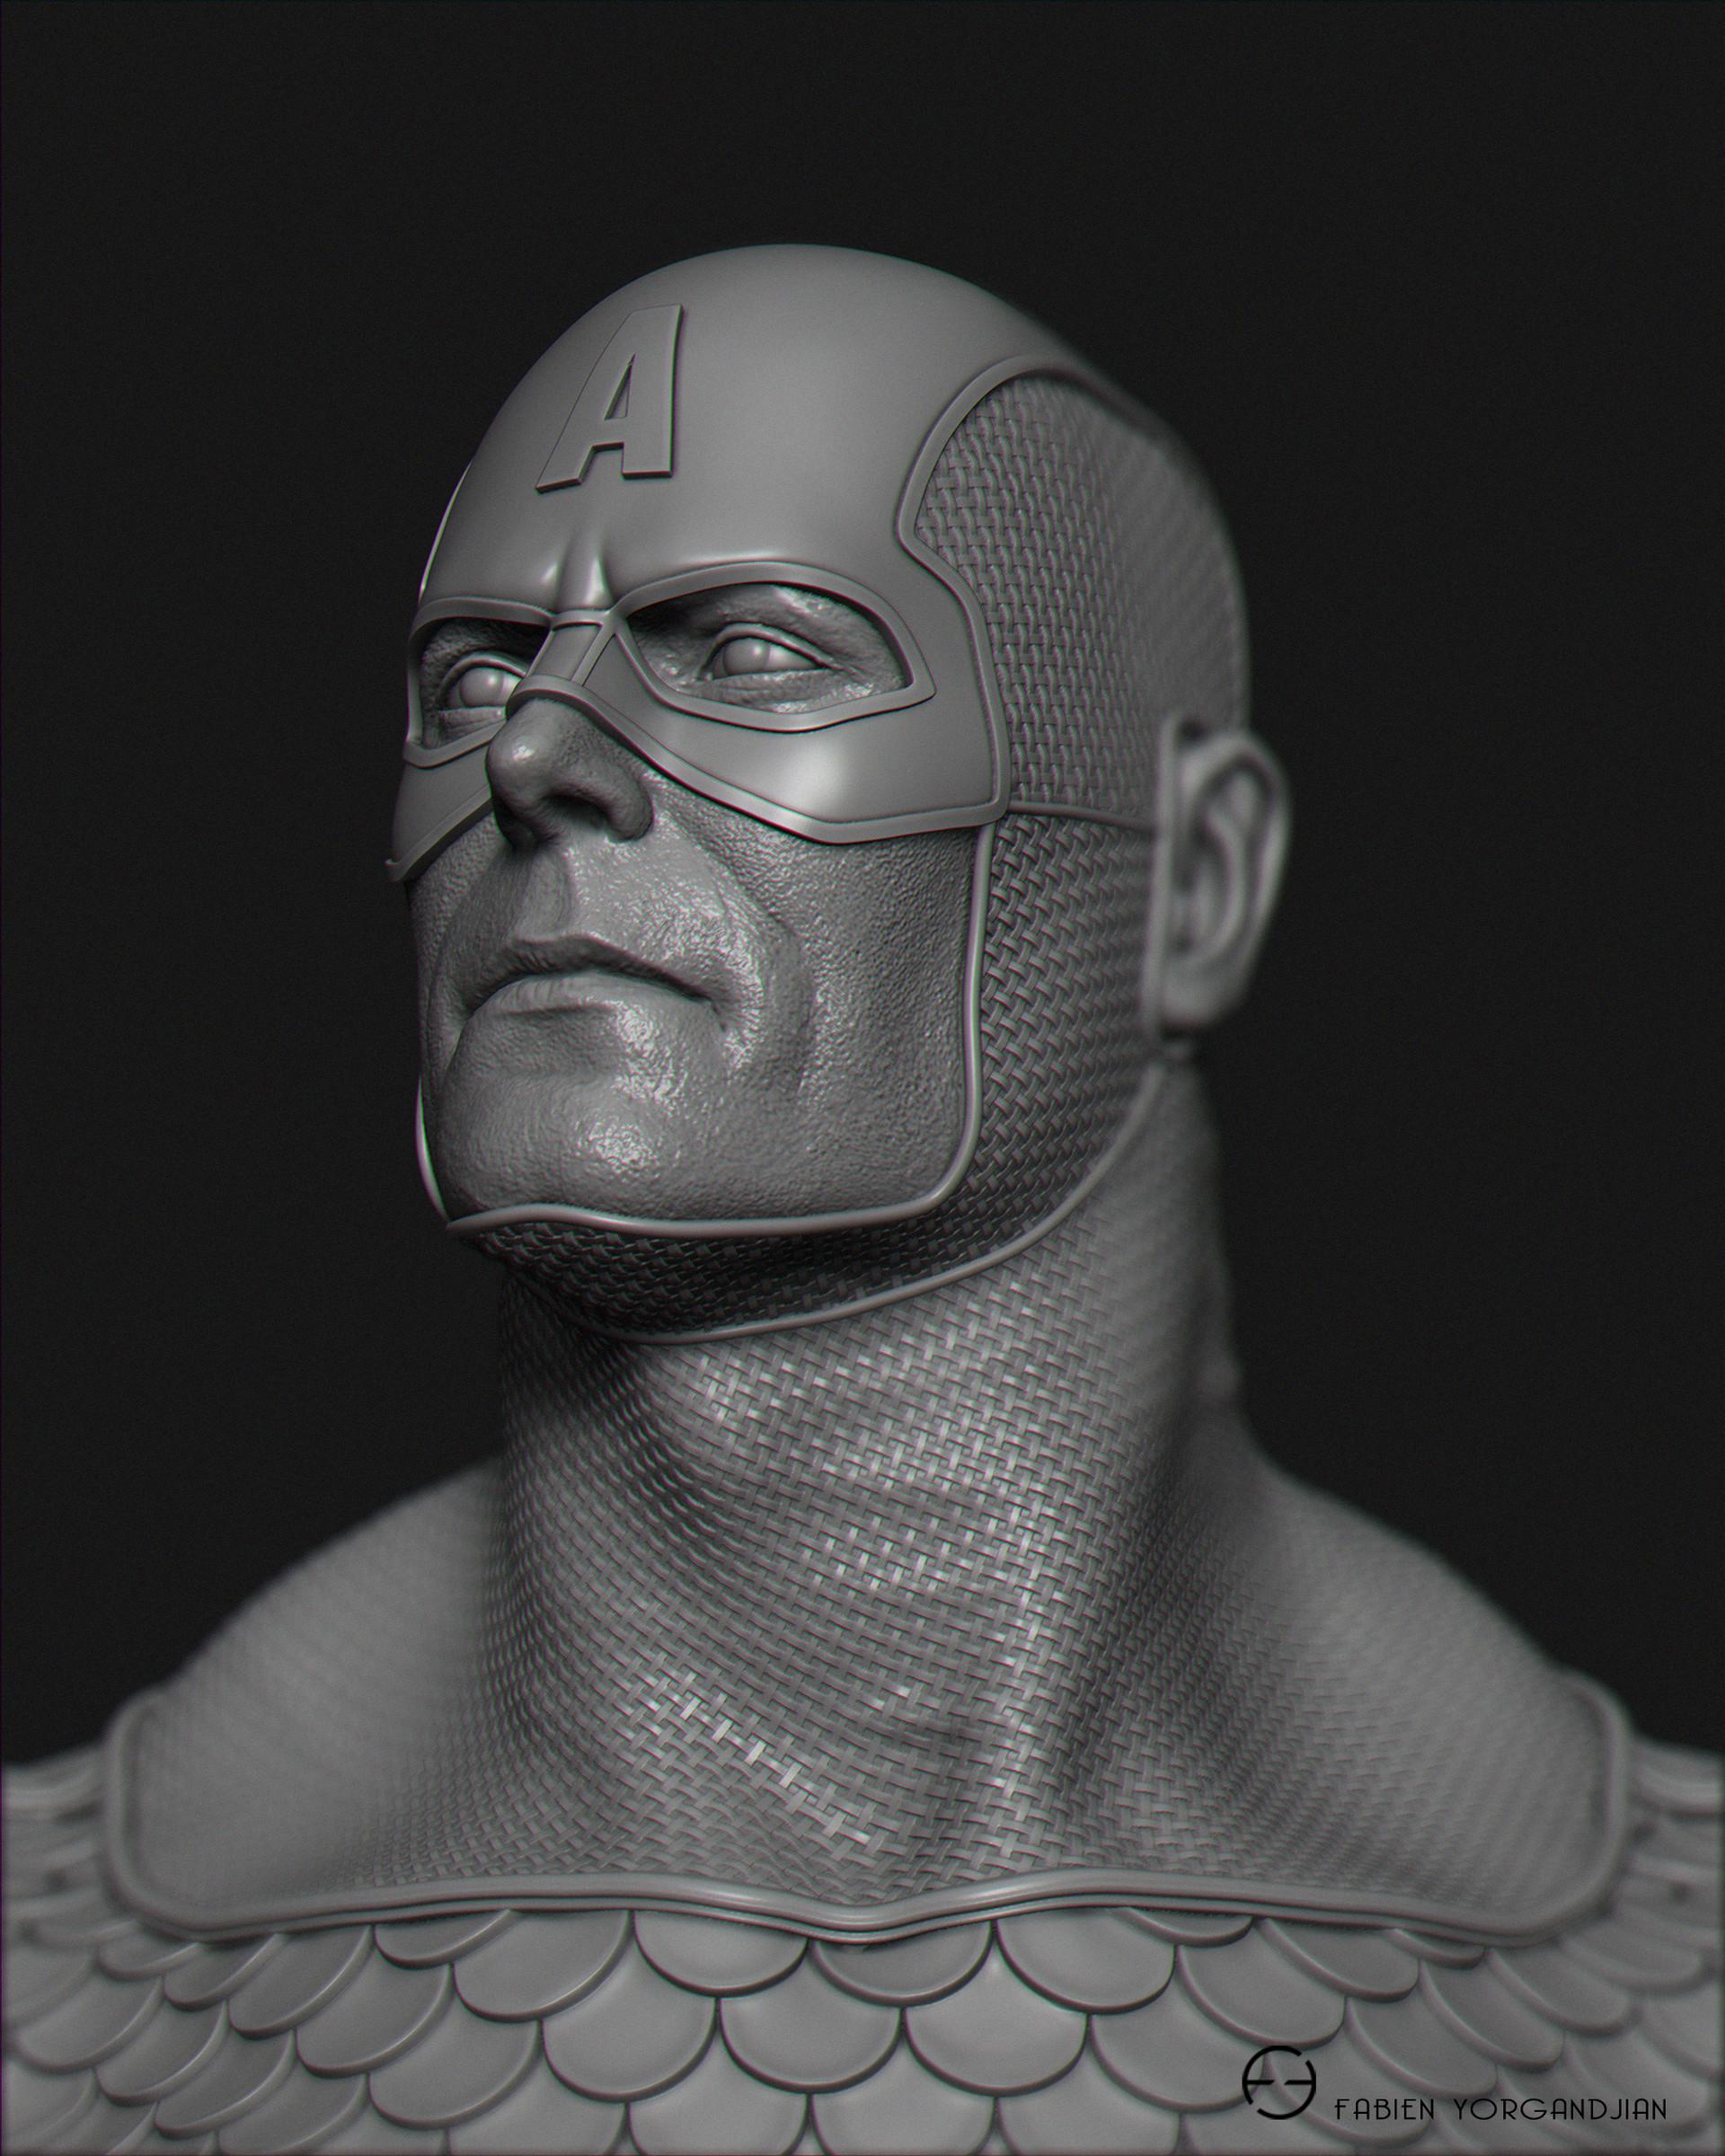 Zbrush 3D render